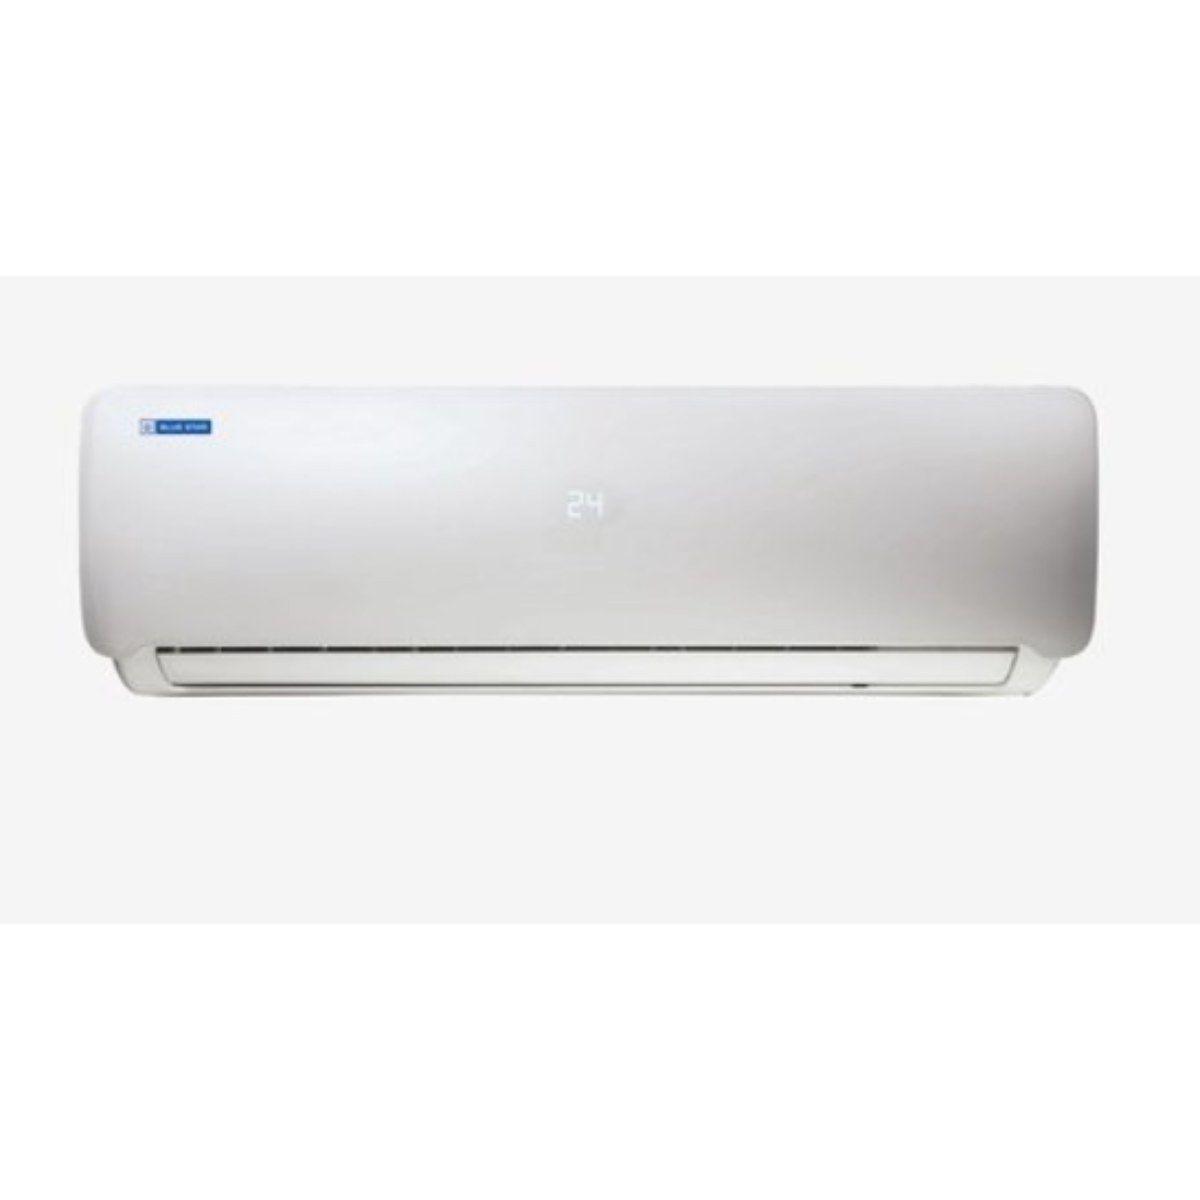 Blue Star 1.5 Ton 3 Star Split Air Conditioner(FS318IATU)